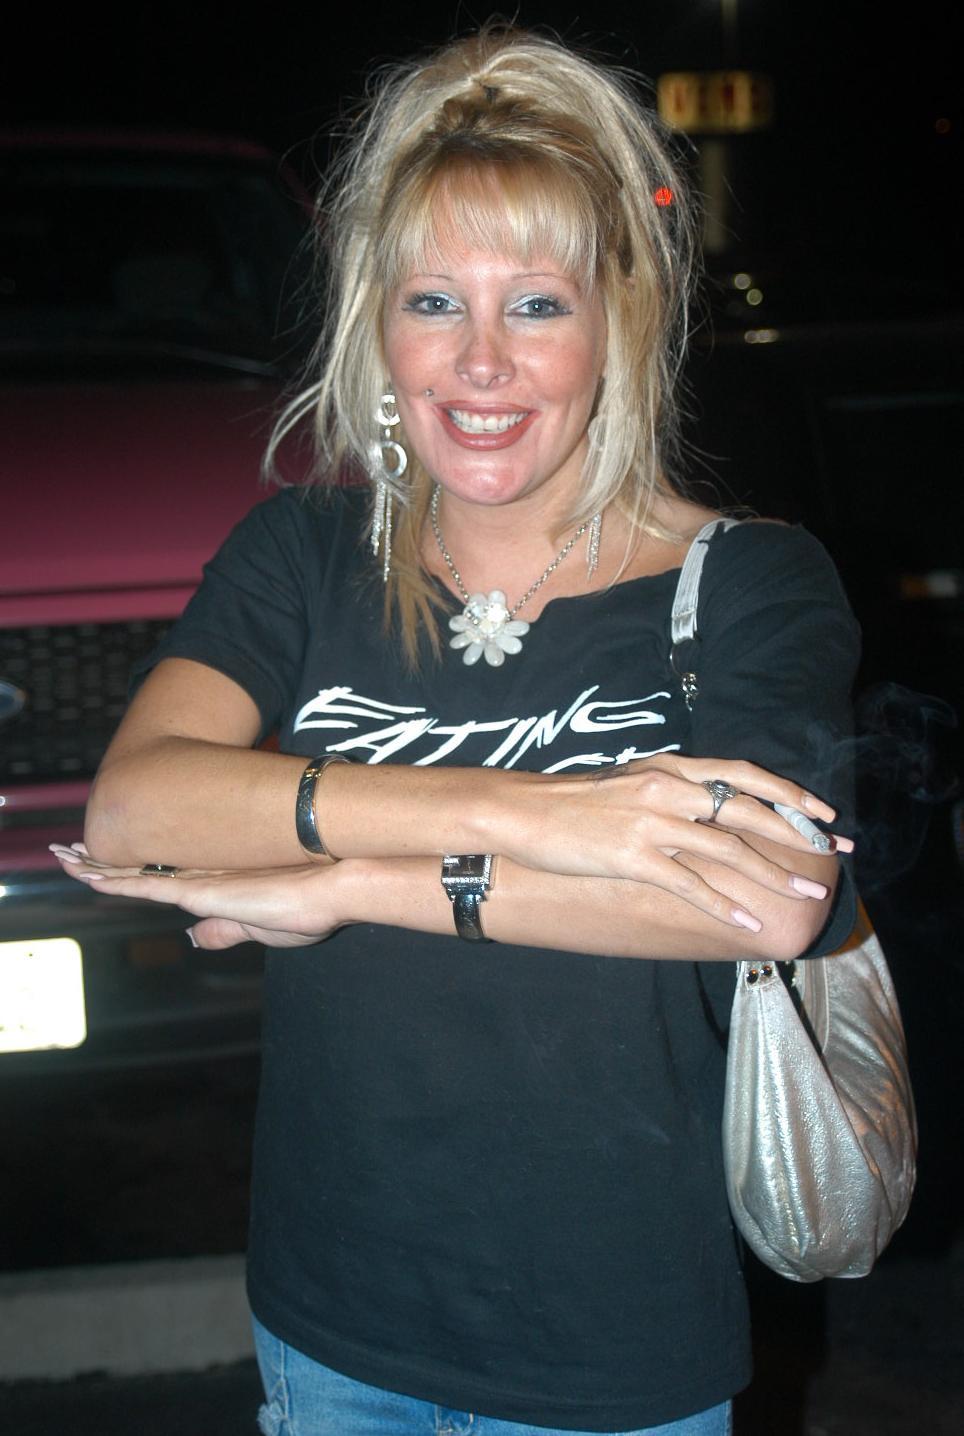 File:Lexxy Foxx Porn Star Karaoke 2005-11-01 1.jpg